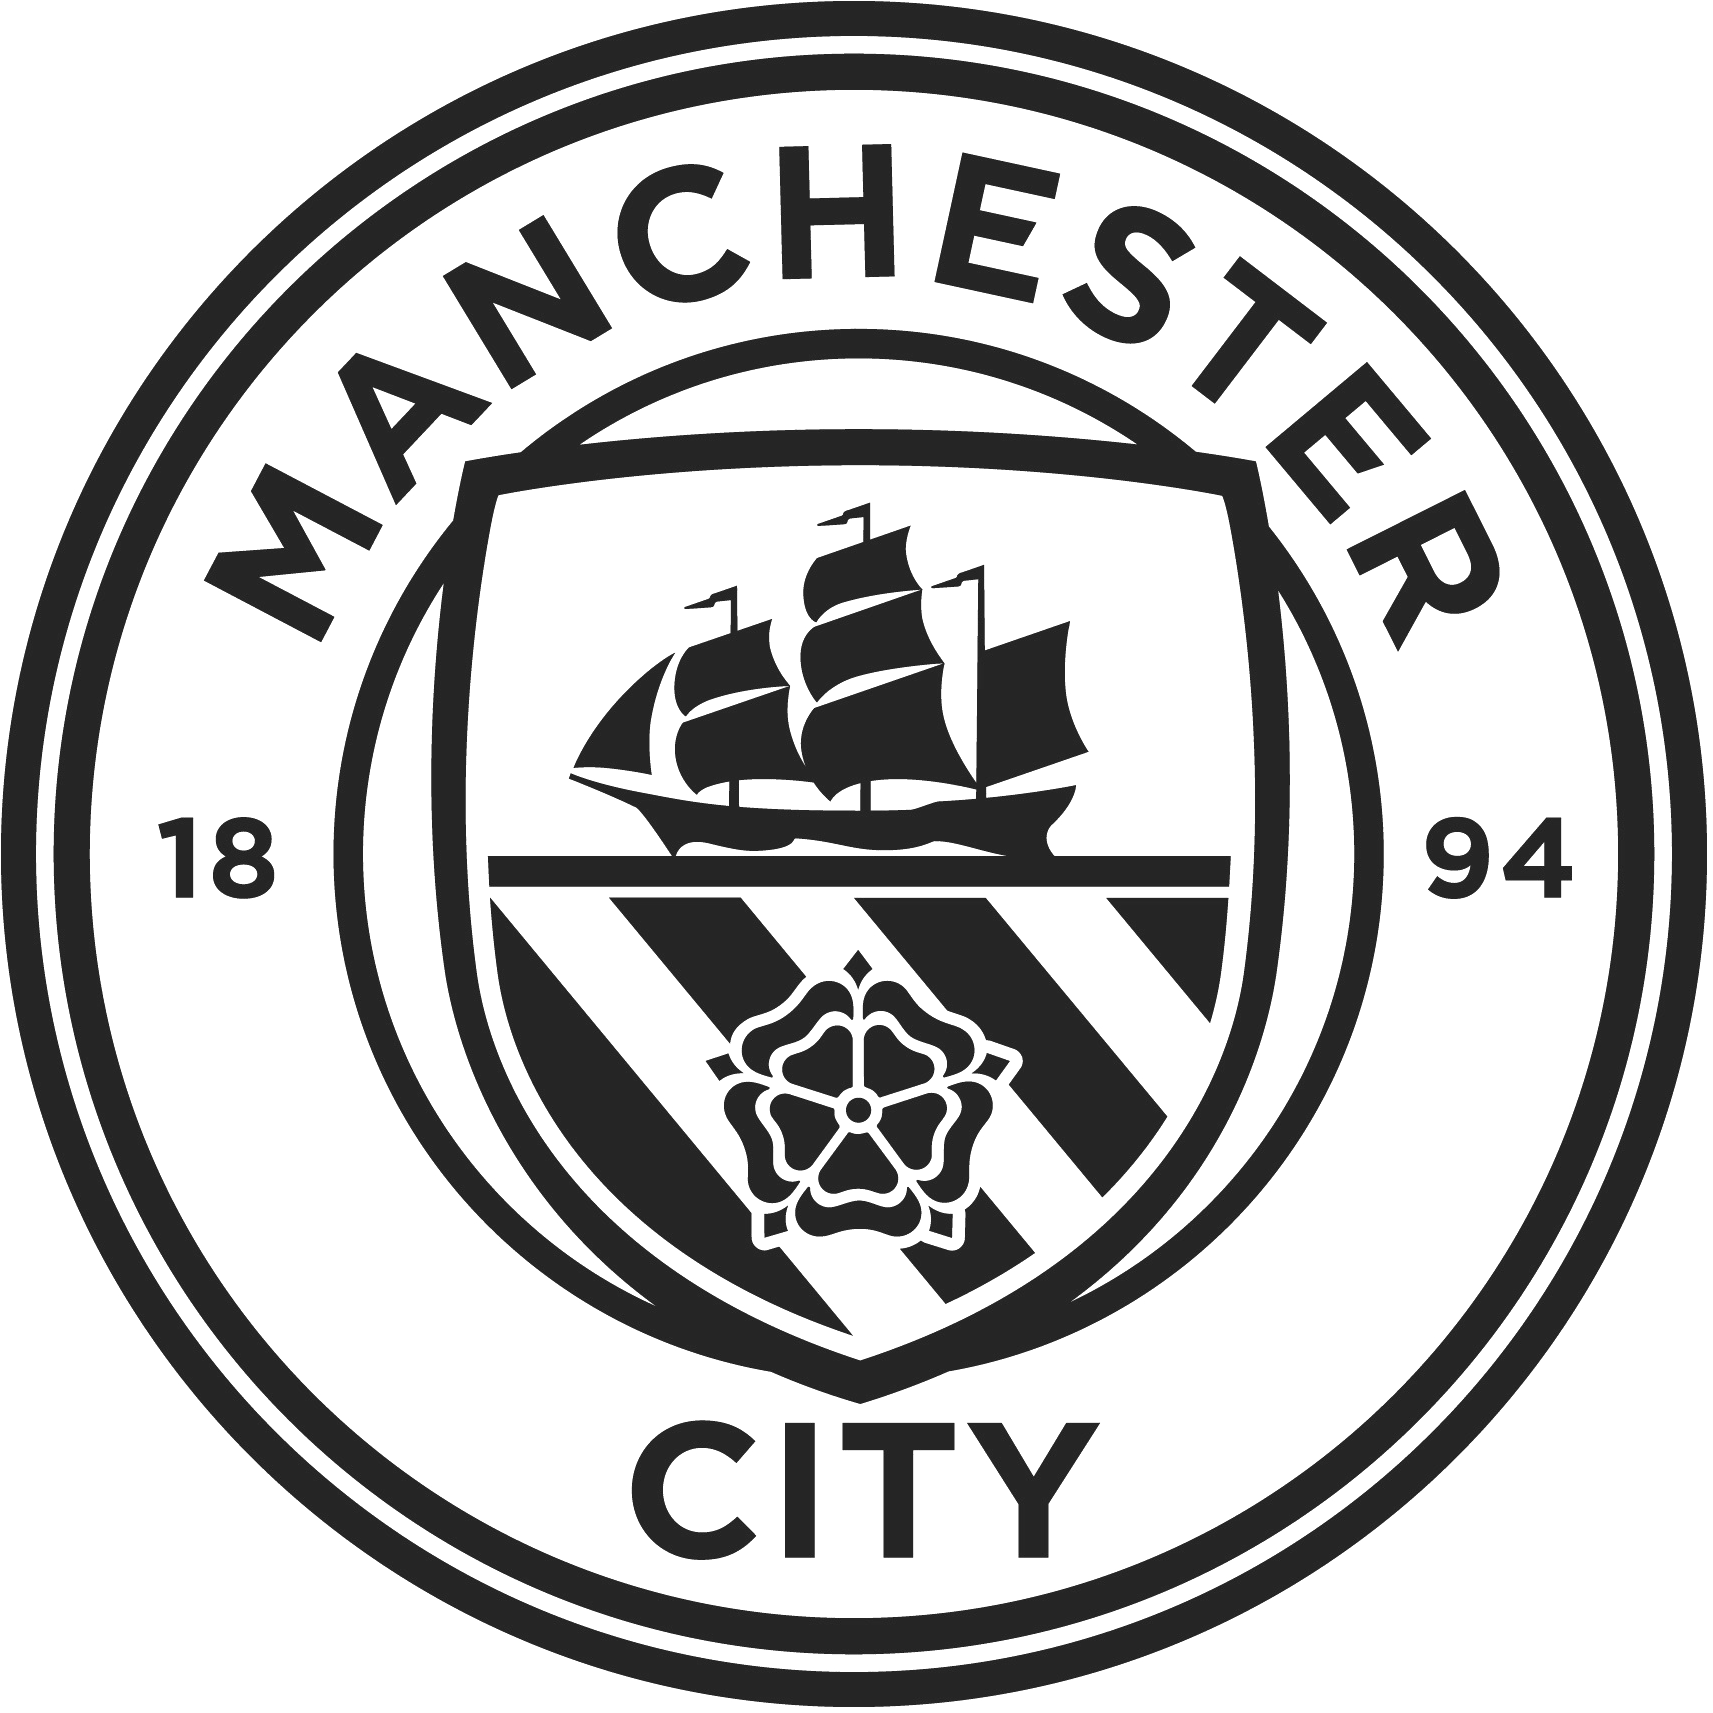 Our Clients Man City Logo Dream League Soccer Clipart Large Size Png Image Pikpng